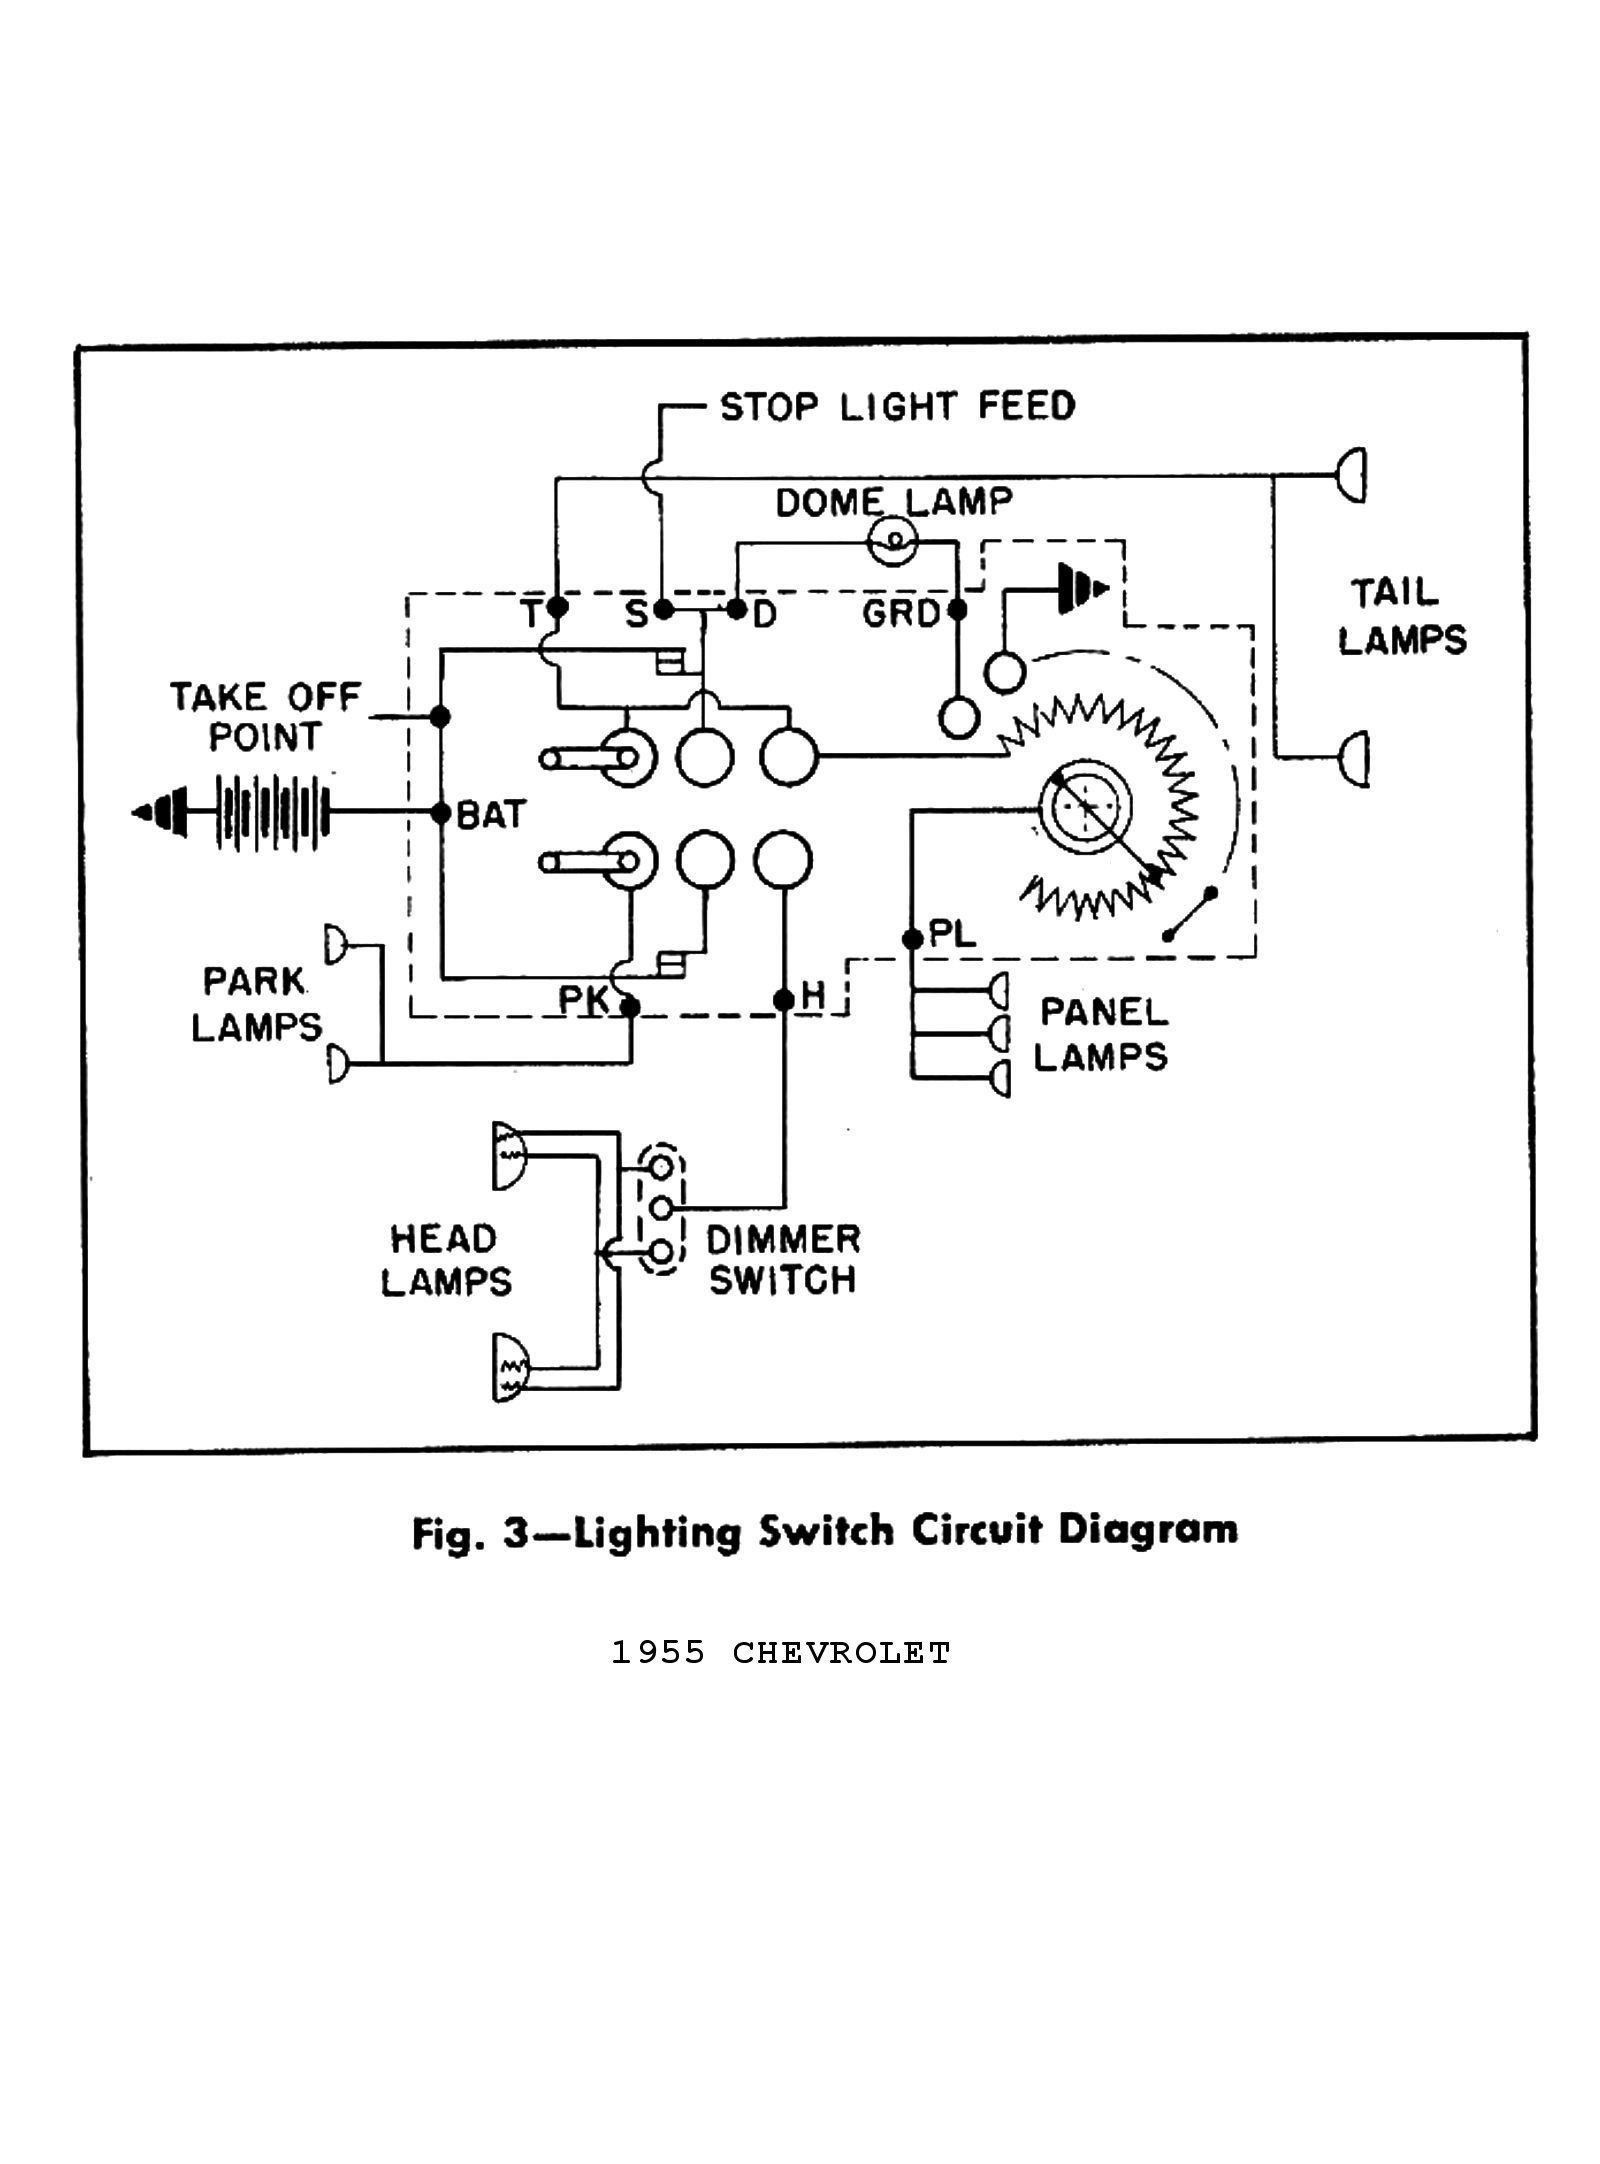 84 Chevy Alternator Wiring Diagram Beautiful Sbc Alternator Wiring Diagram Diagrams Of 84 Chevy Alternator Wiring Diagram